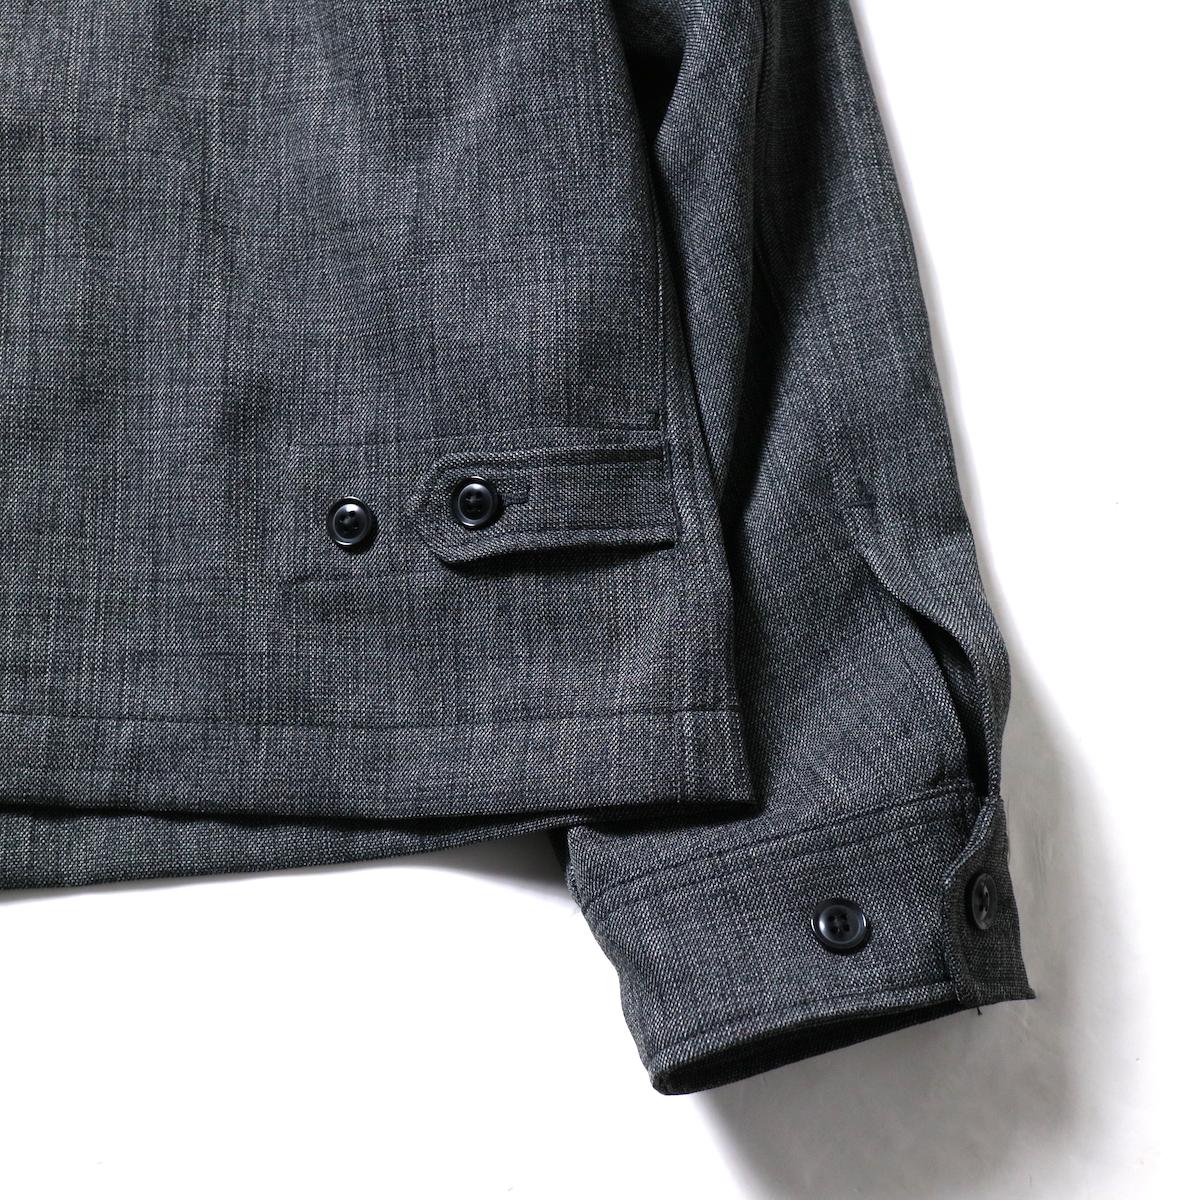 Engineered Garments / Claigton Jacket - Polyester Sharkskin (Charcoal)アジャスター、袖